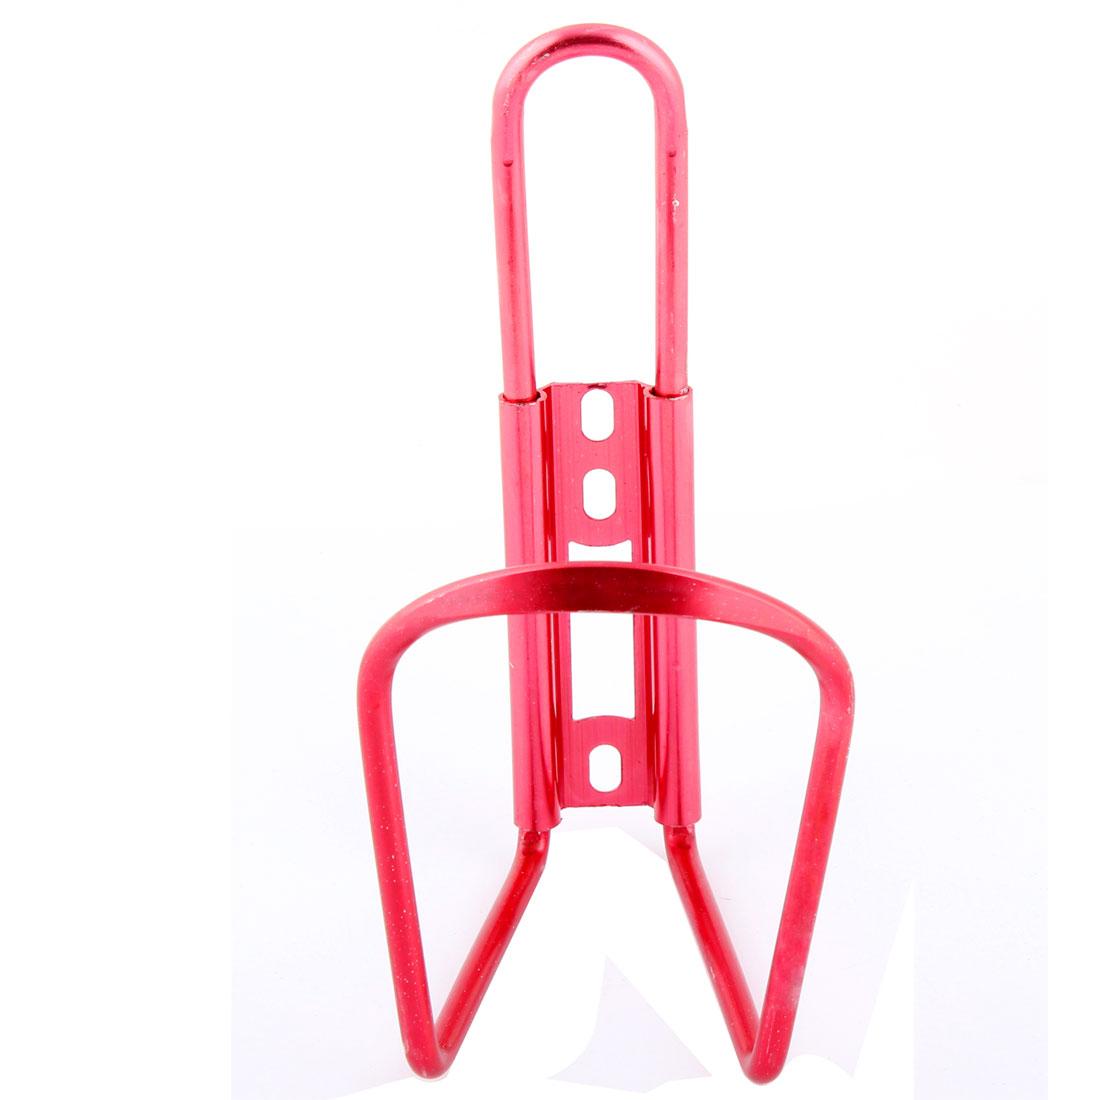 Metal Cycling Sport Bike Bicycle Drink Water Bottle Bracket Rack Holder Fuchsia